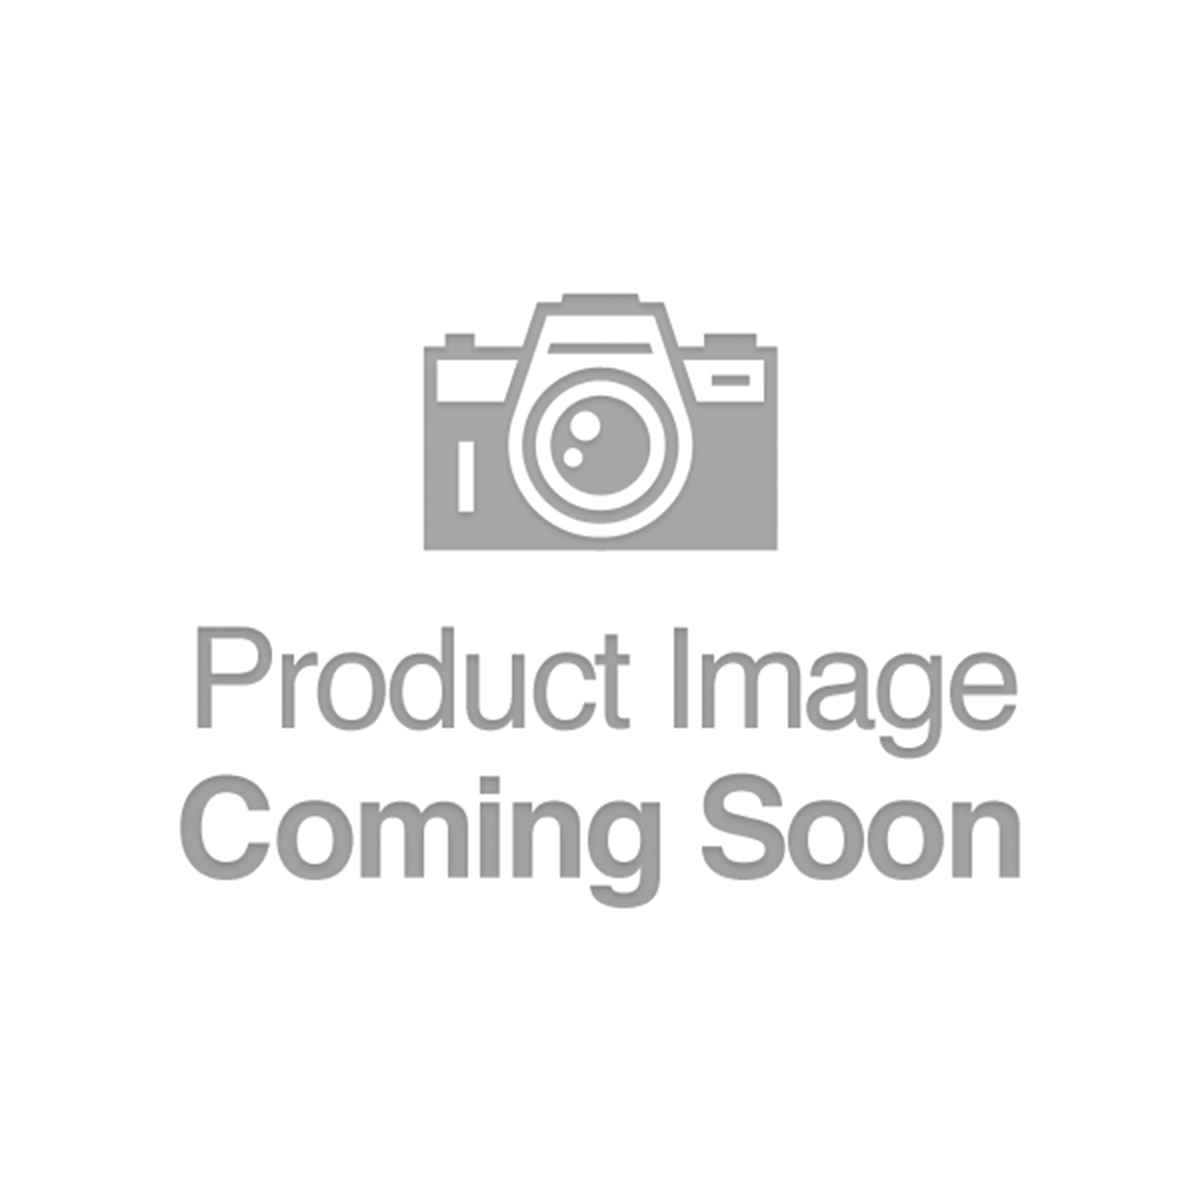 Blooming Prairie - Minnesota - CH 6775 - FR 624 - PMG 25